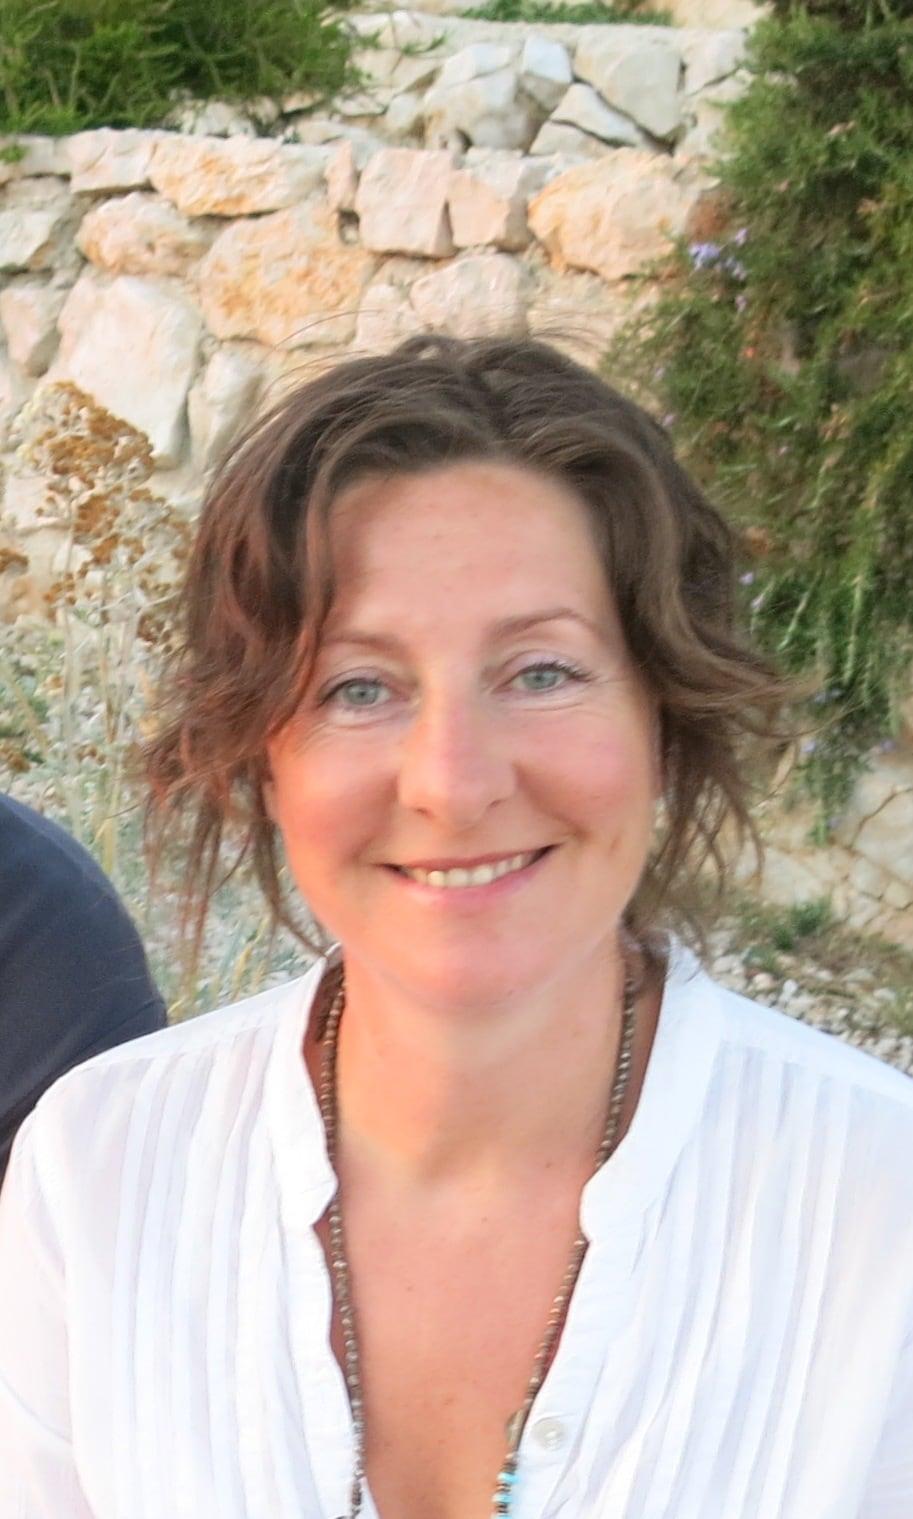 Daniela from Dubrovnik